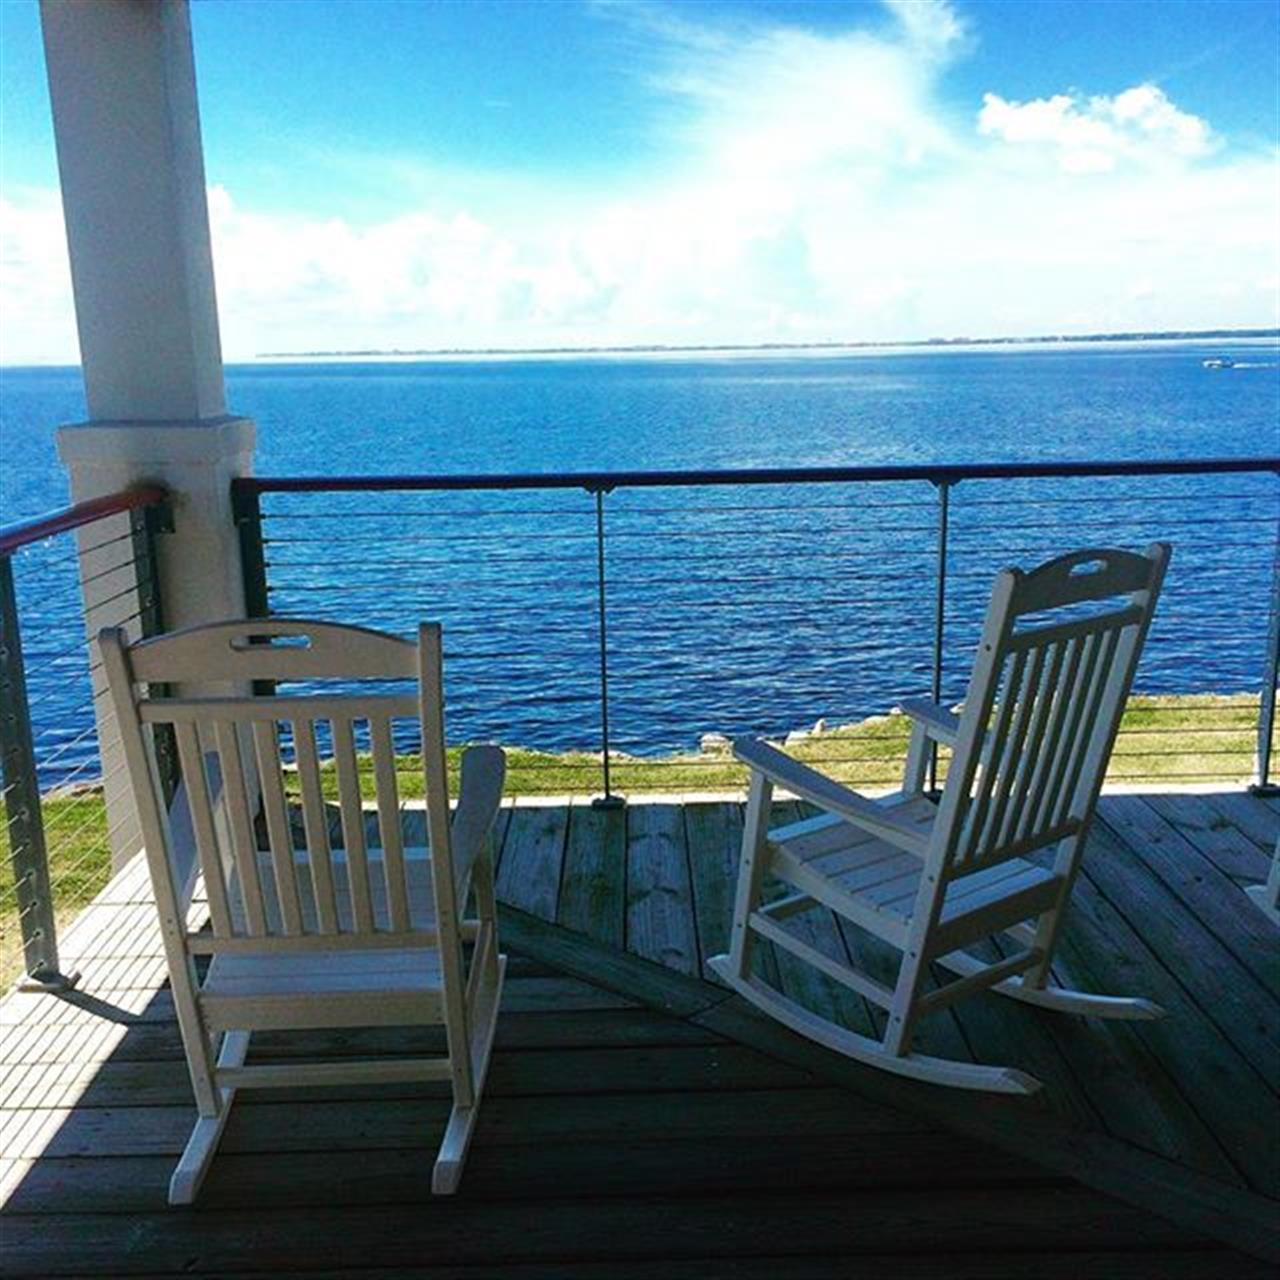 Davis Island Yacht Club #tampa #florida #tampabay #davisisland